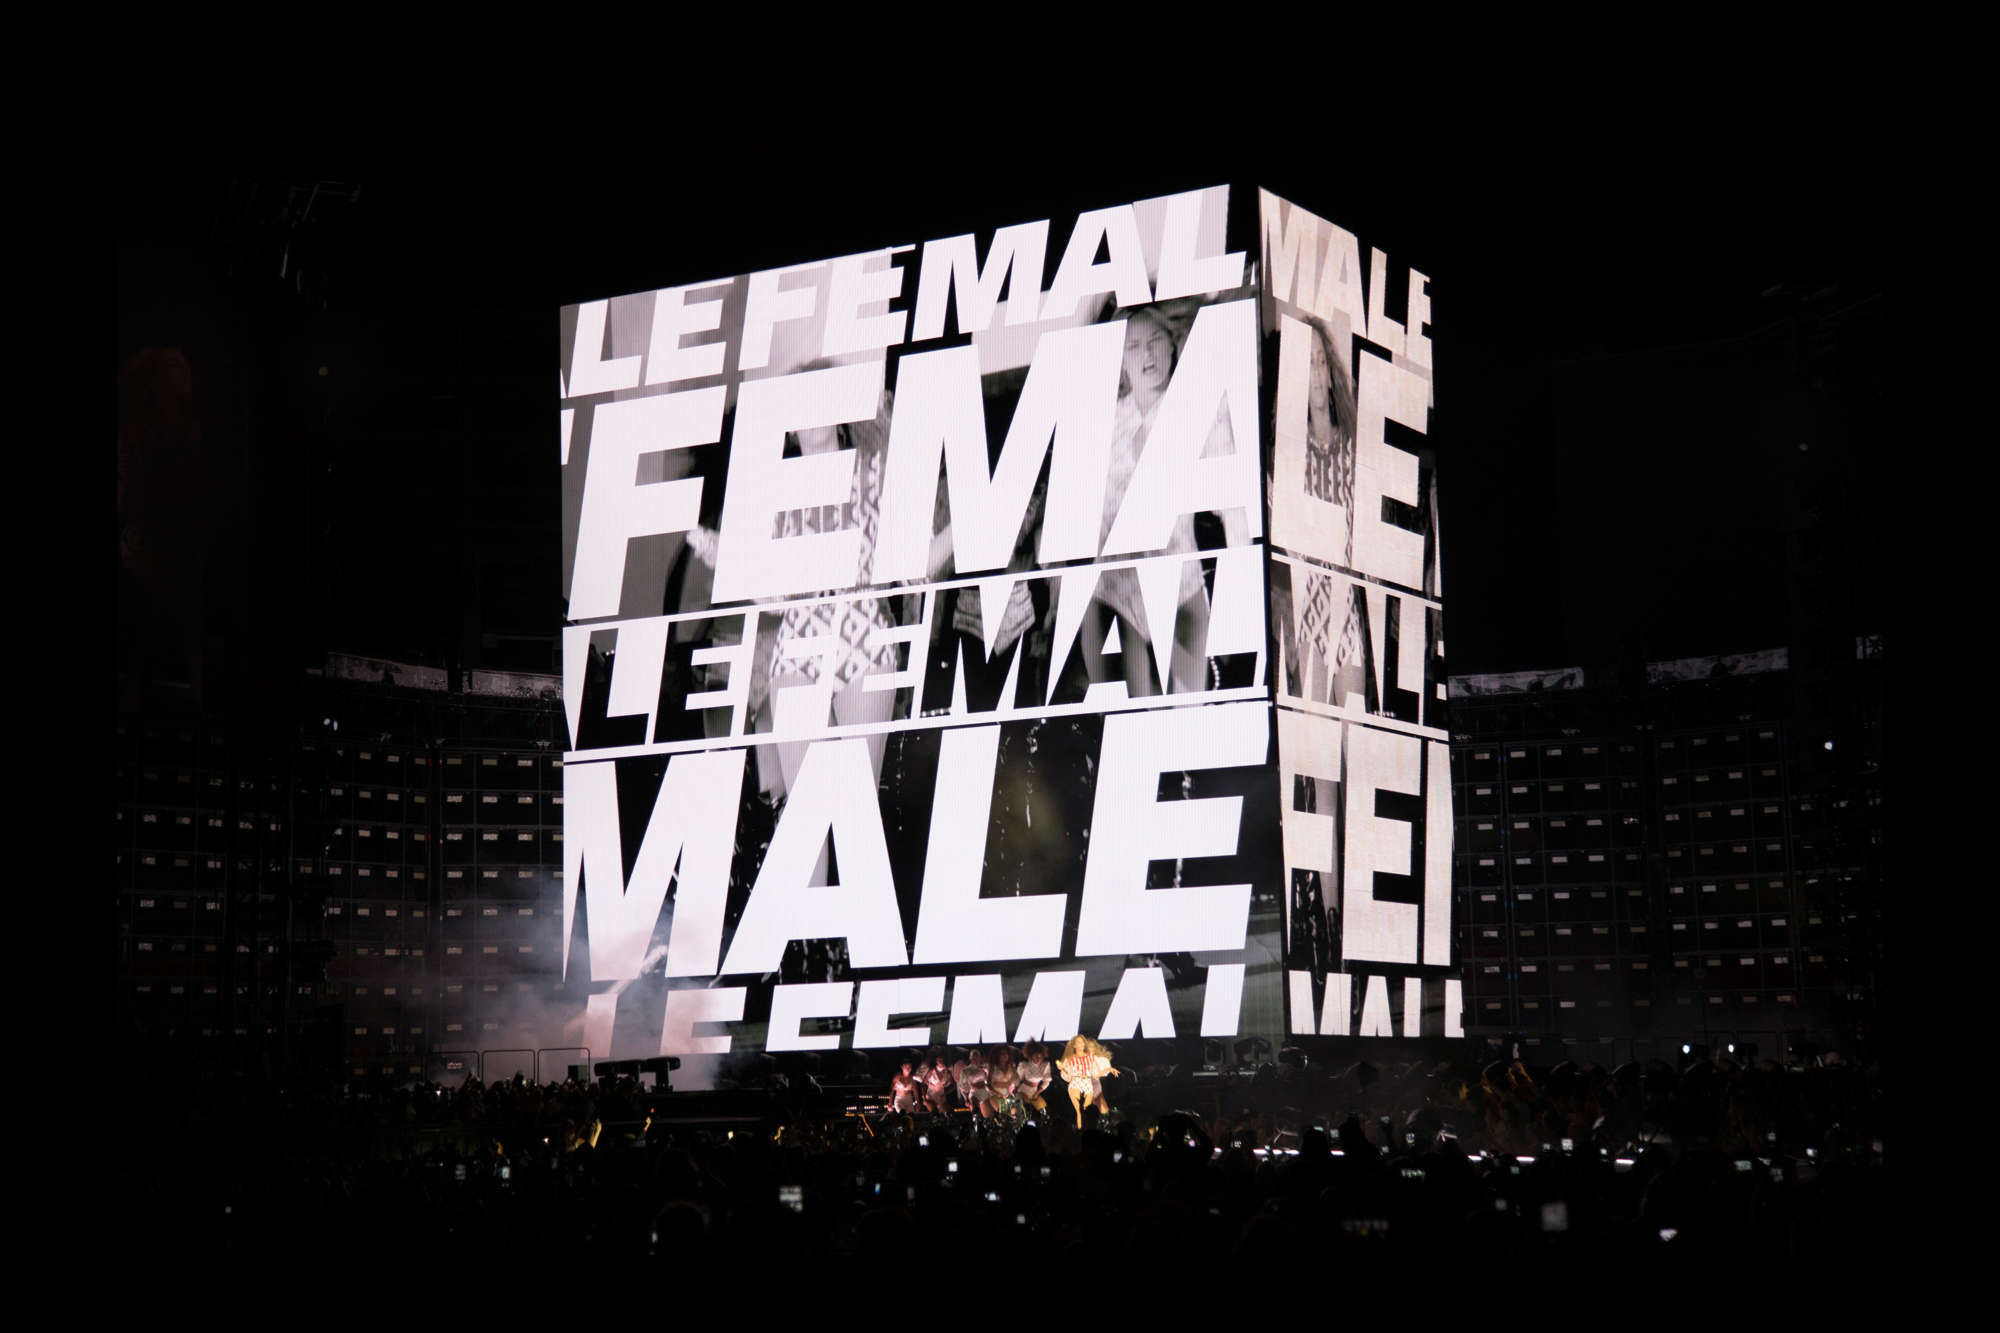 From Knockout to Times New Roman: Beyoncé's fierce